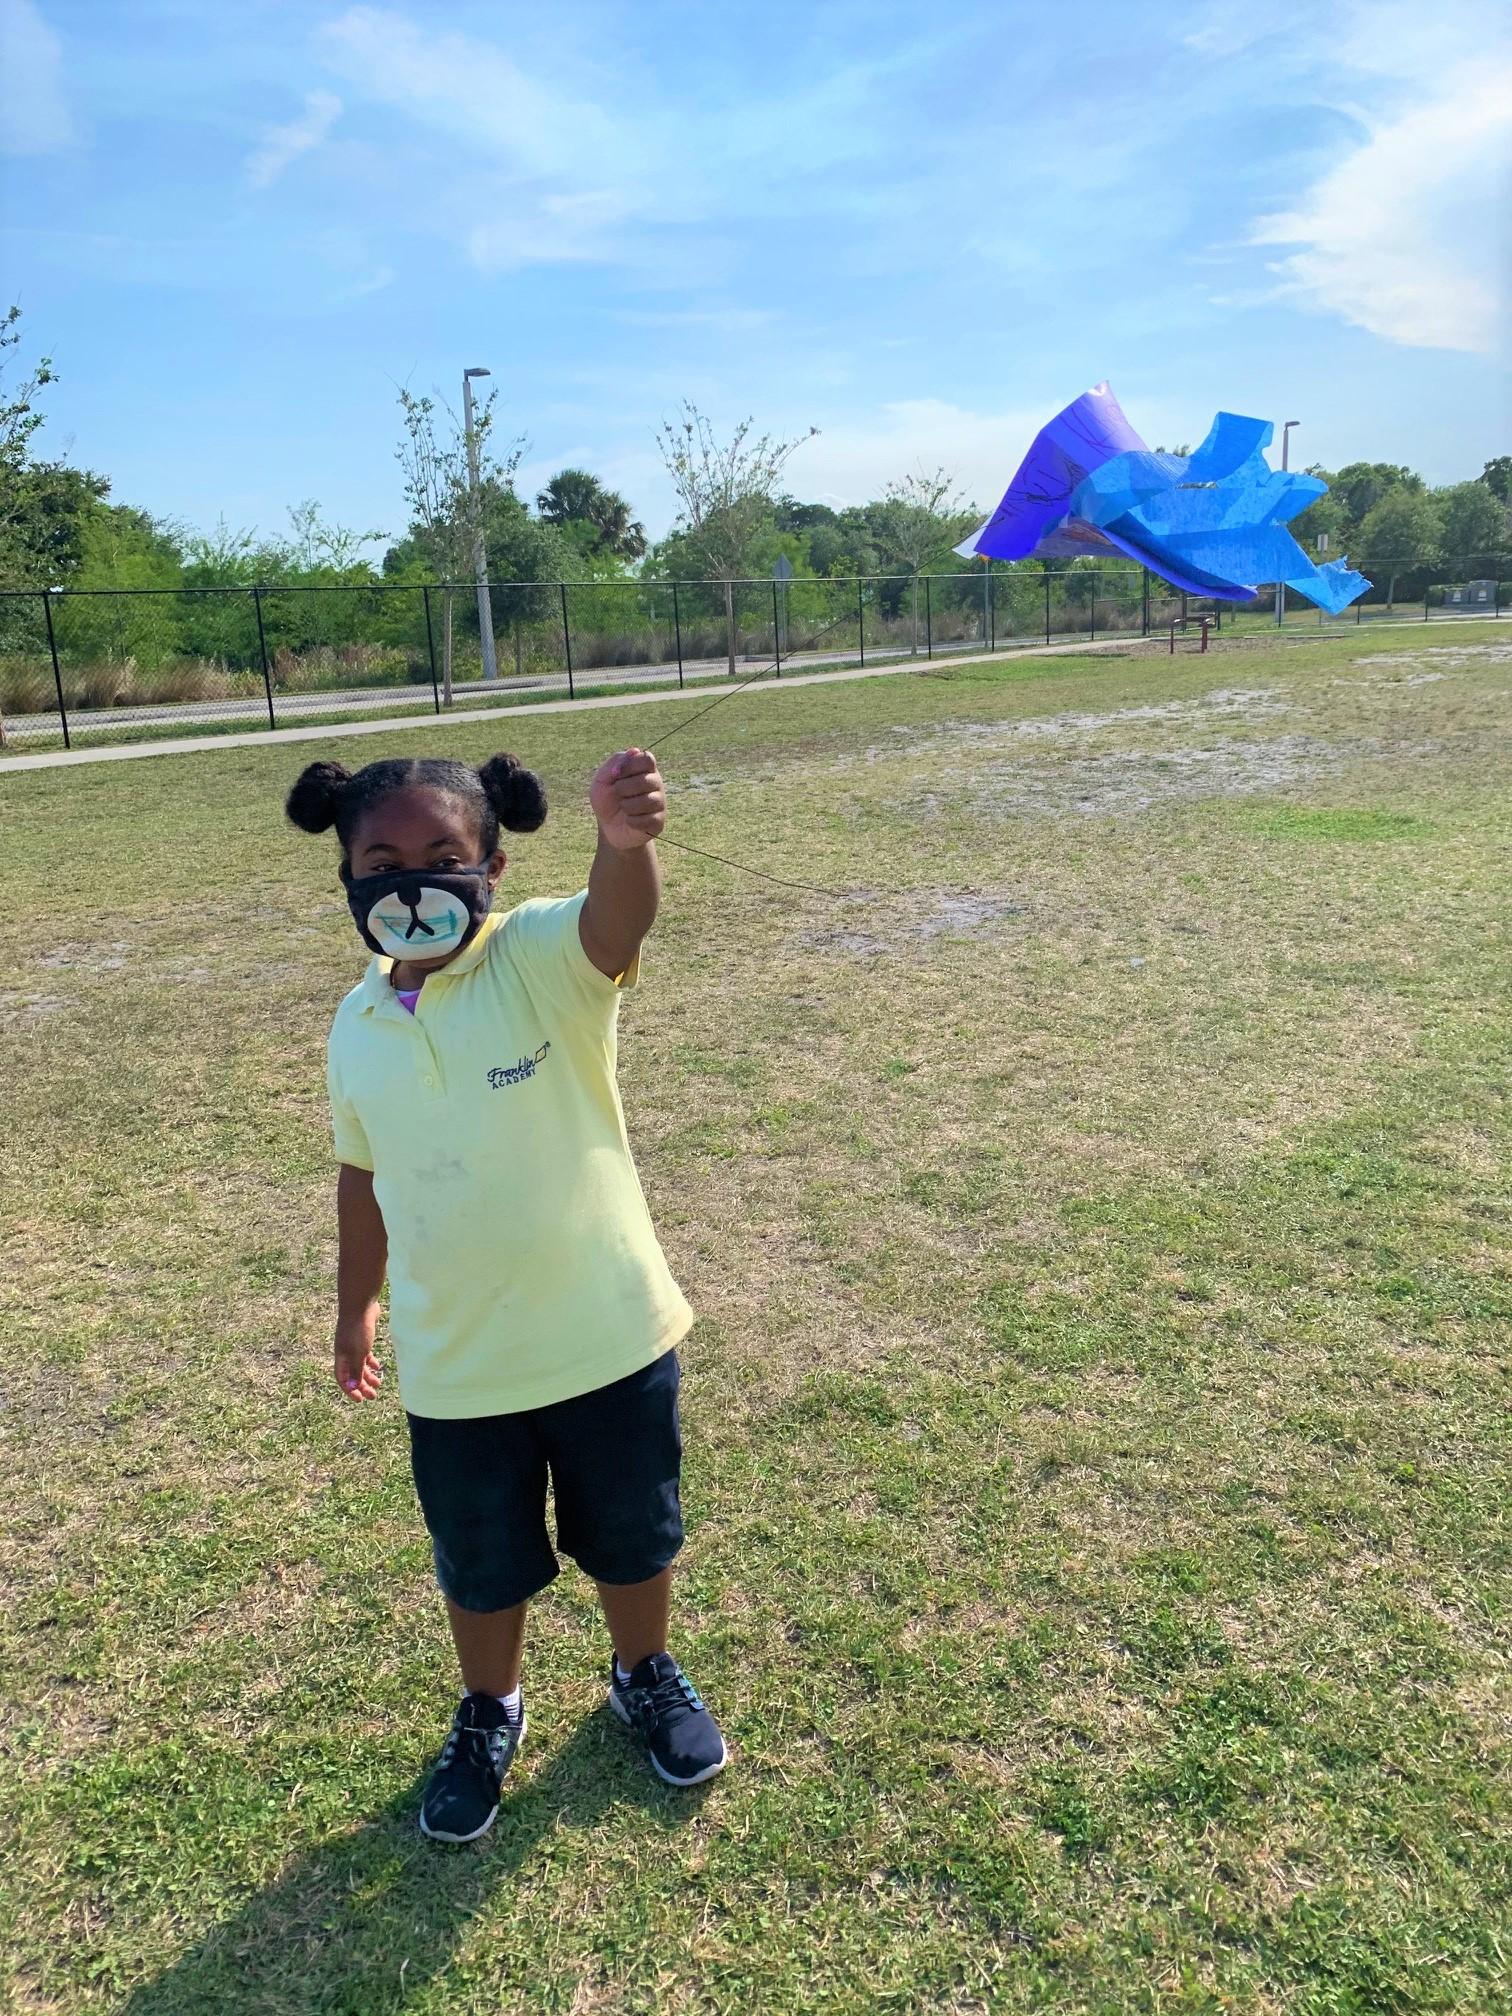 Kite Day Image number 2